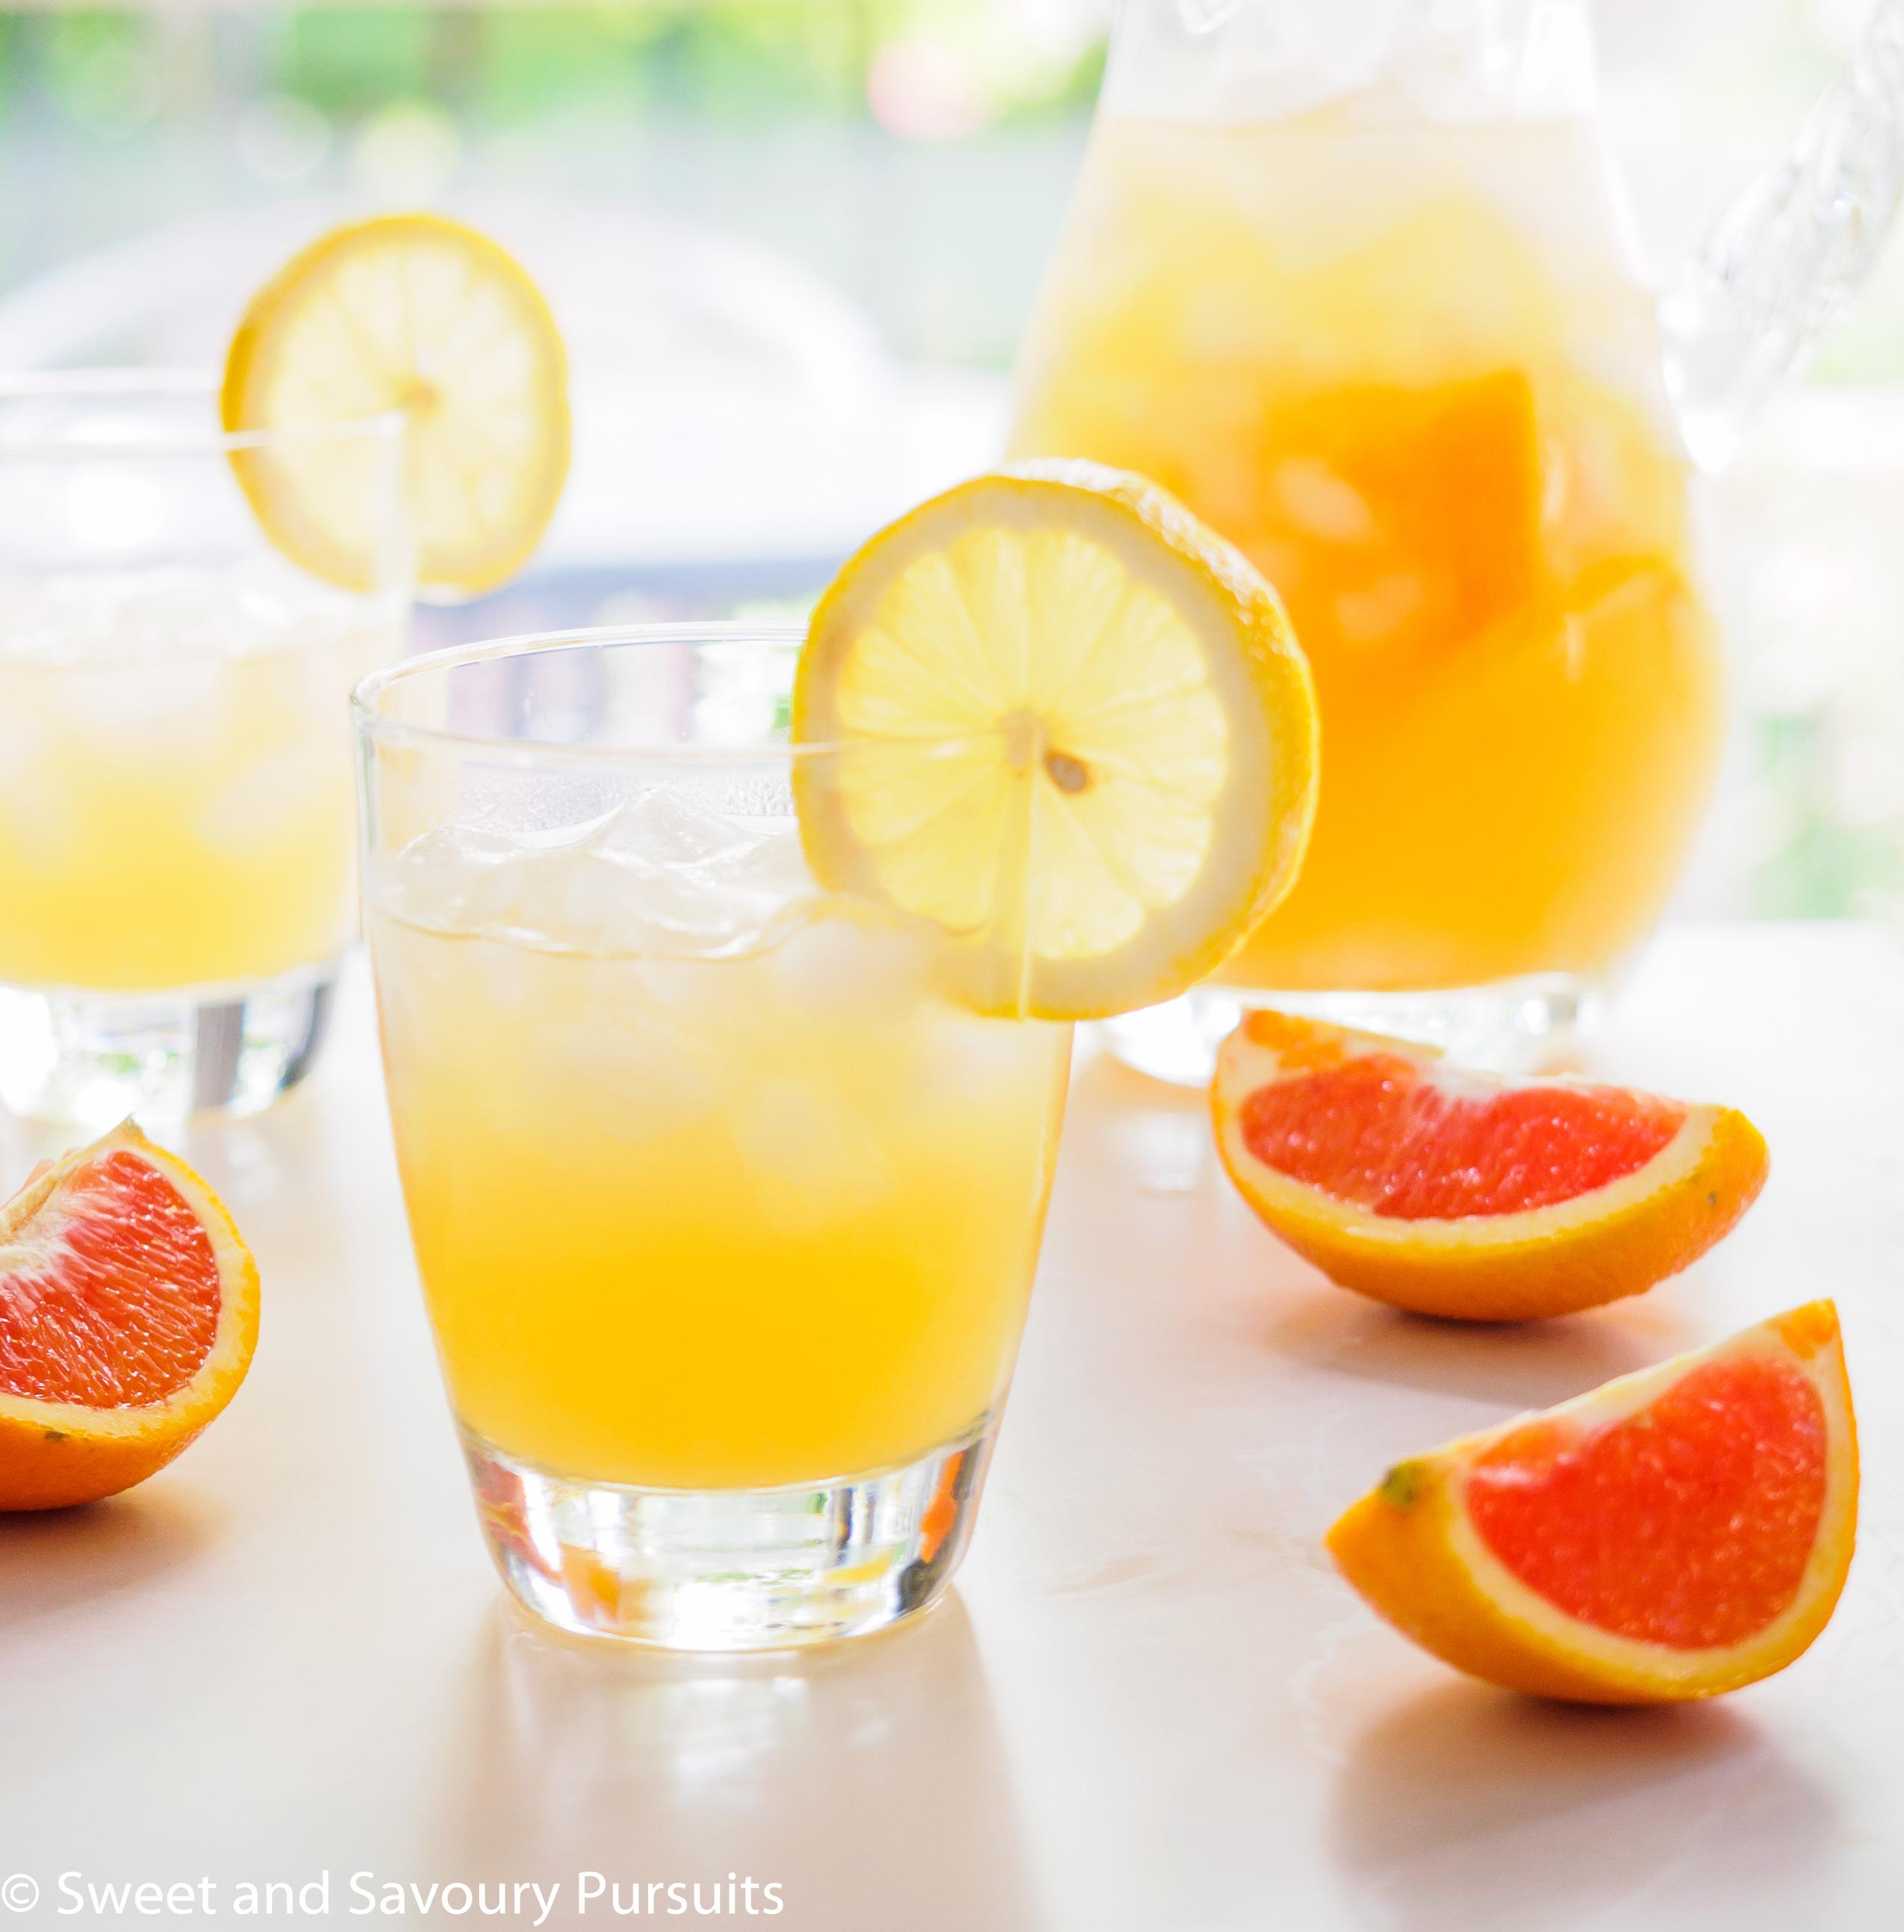 Cara Cara Orange and Citrus Drink poured into glasses.